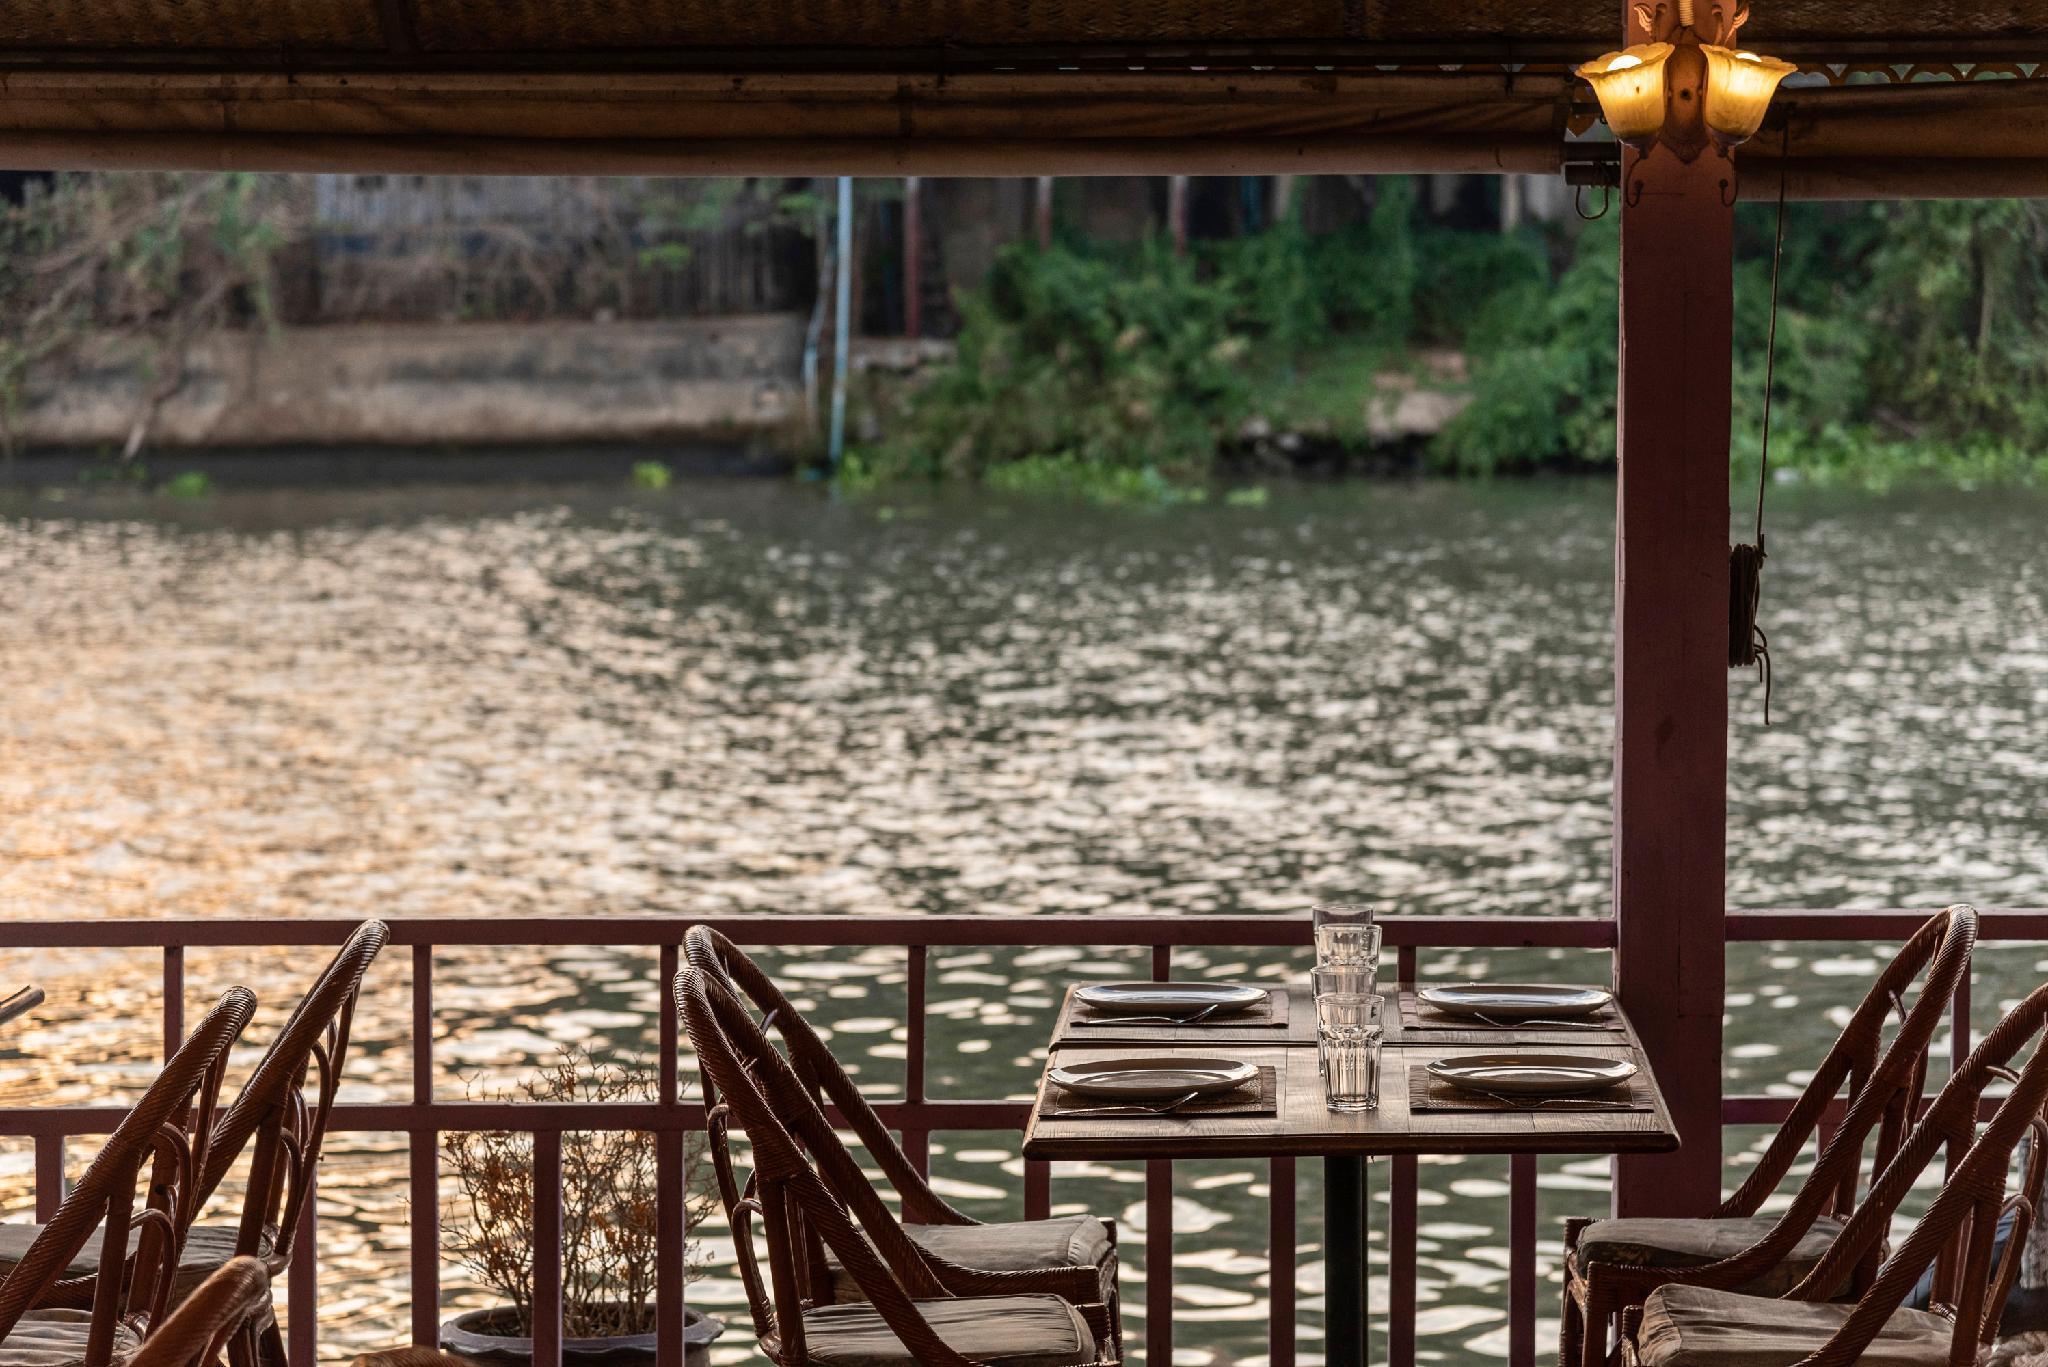 Ayothaya Riverside Hotel โรงแรมอโยธยา ริเวอร์ไซด์